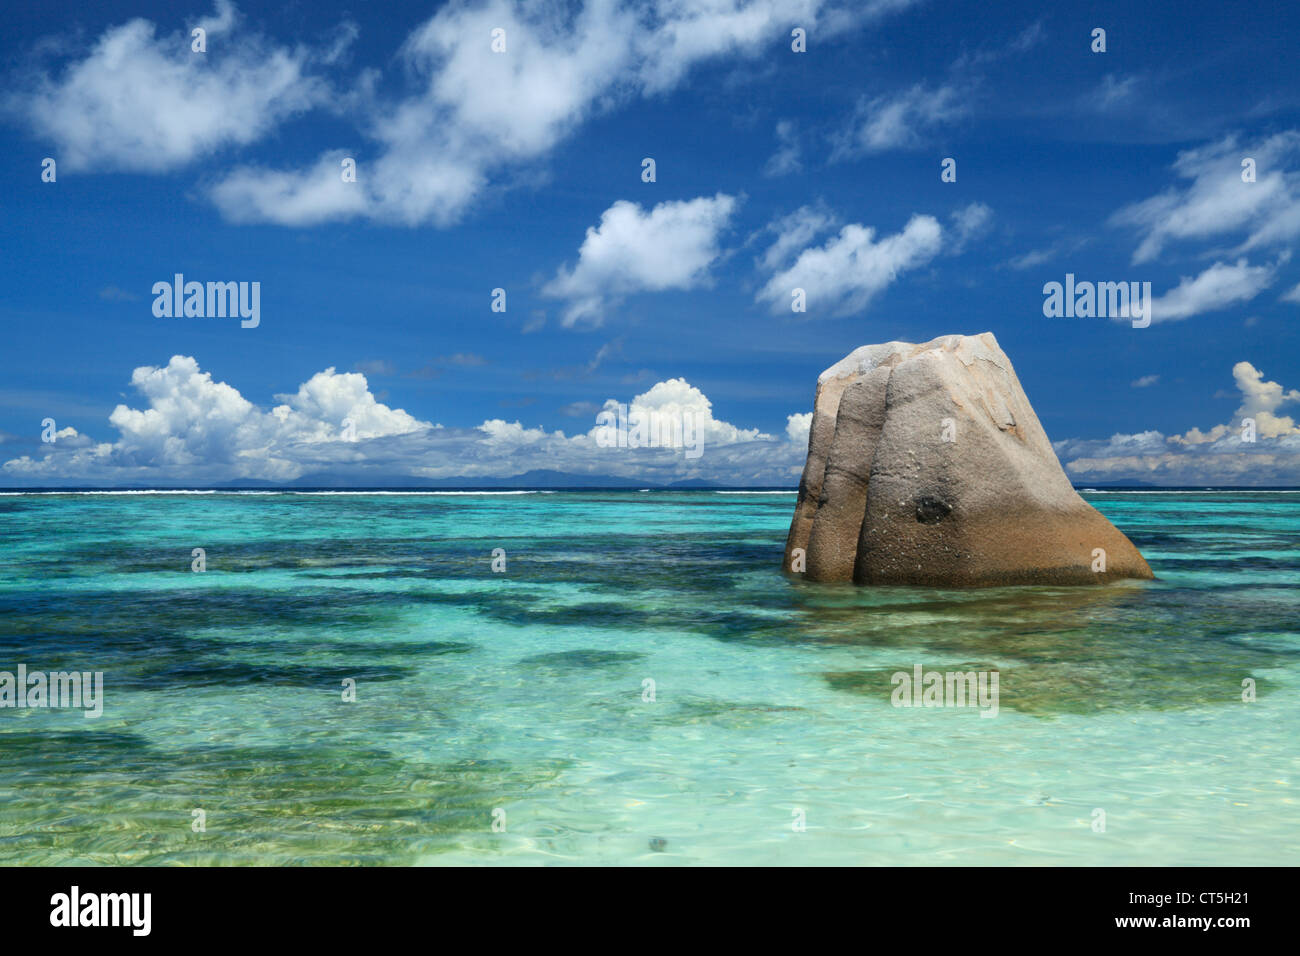 Anse Source D'Argent, La Digue, Seychelles, Indian Ocean on La Digue in the Seychelles - Stock Image